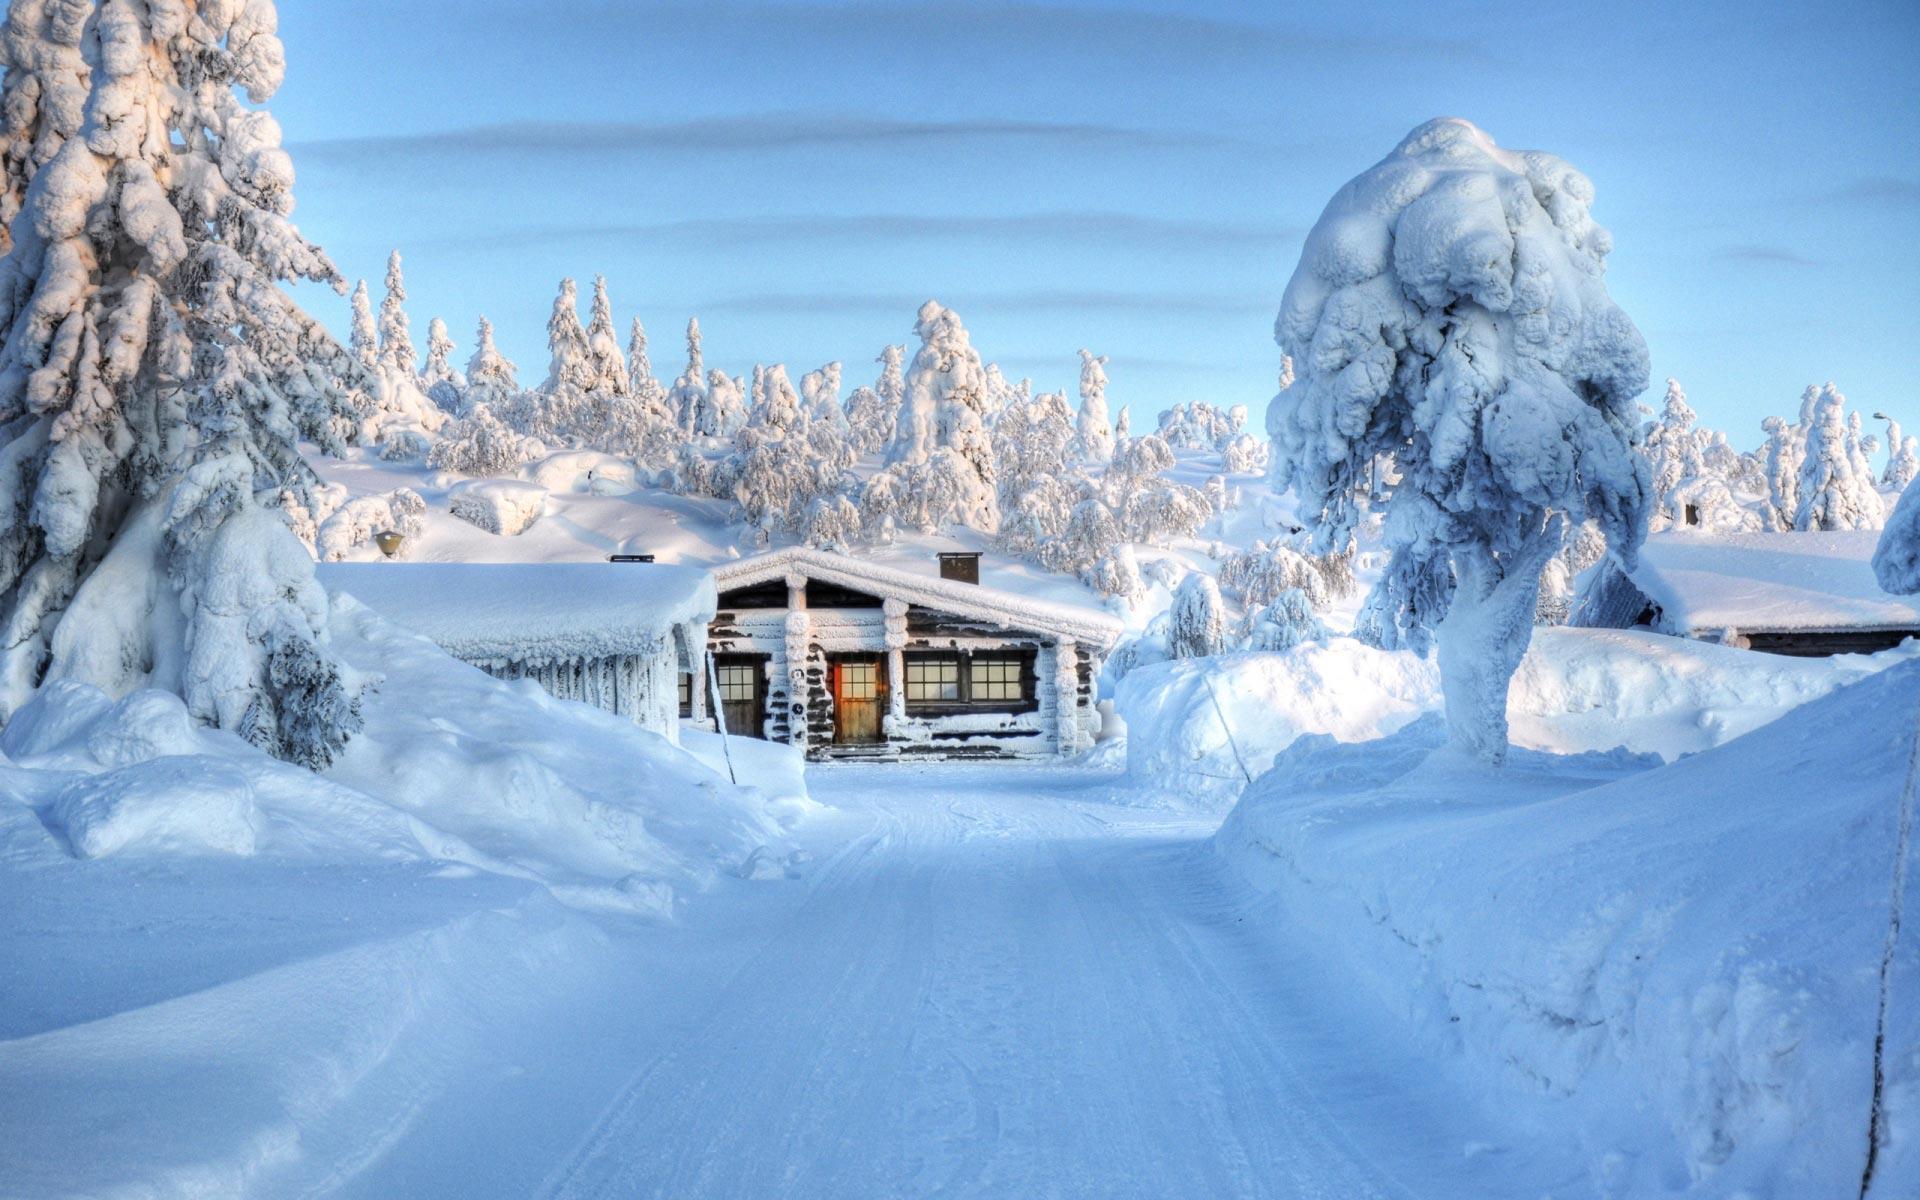 Snow Hd Wallpapers Wallpaper Cave